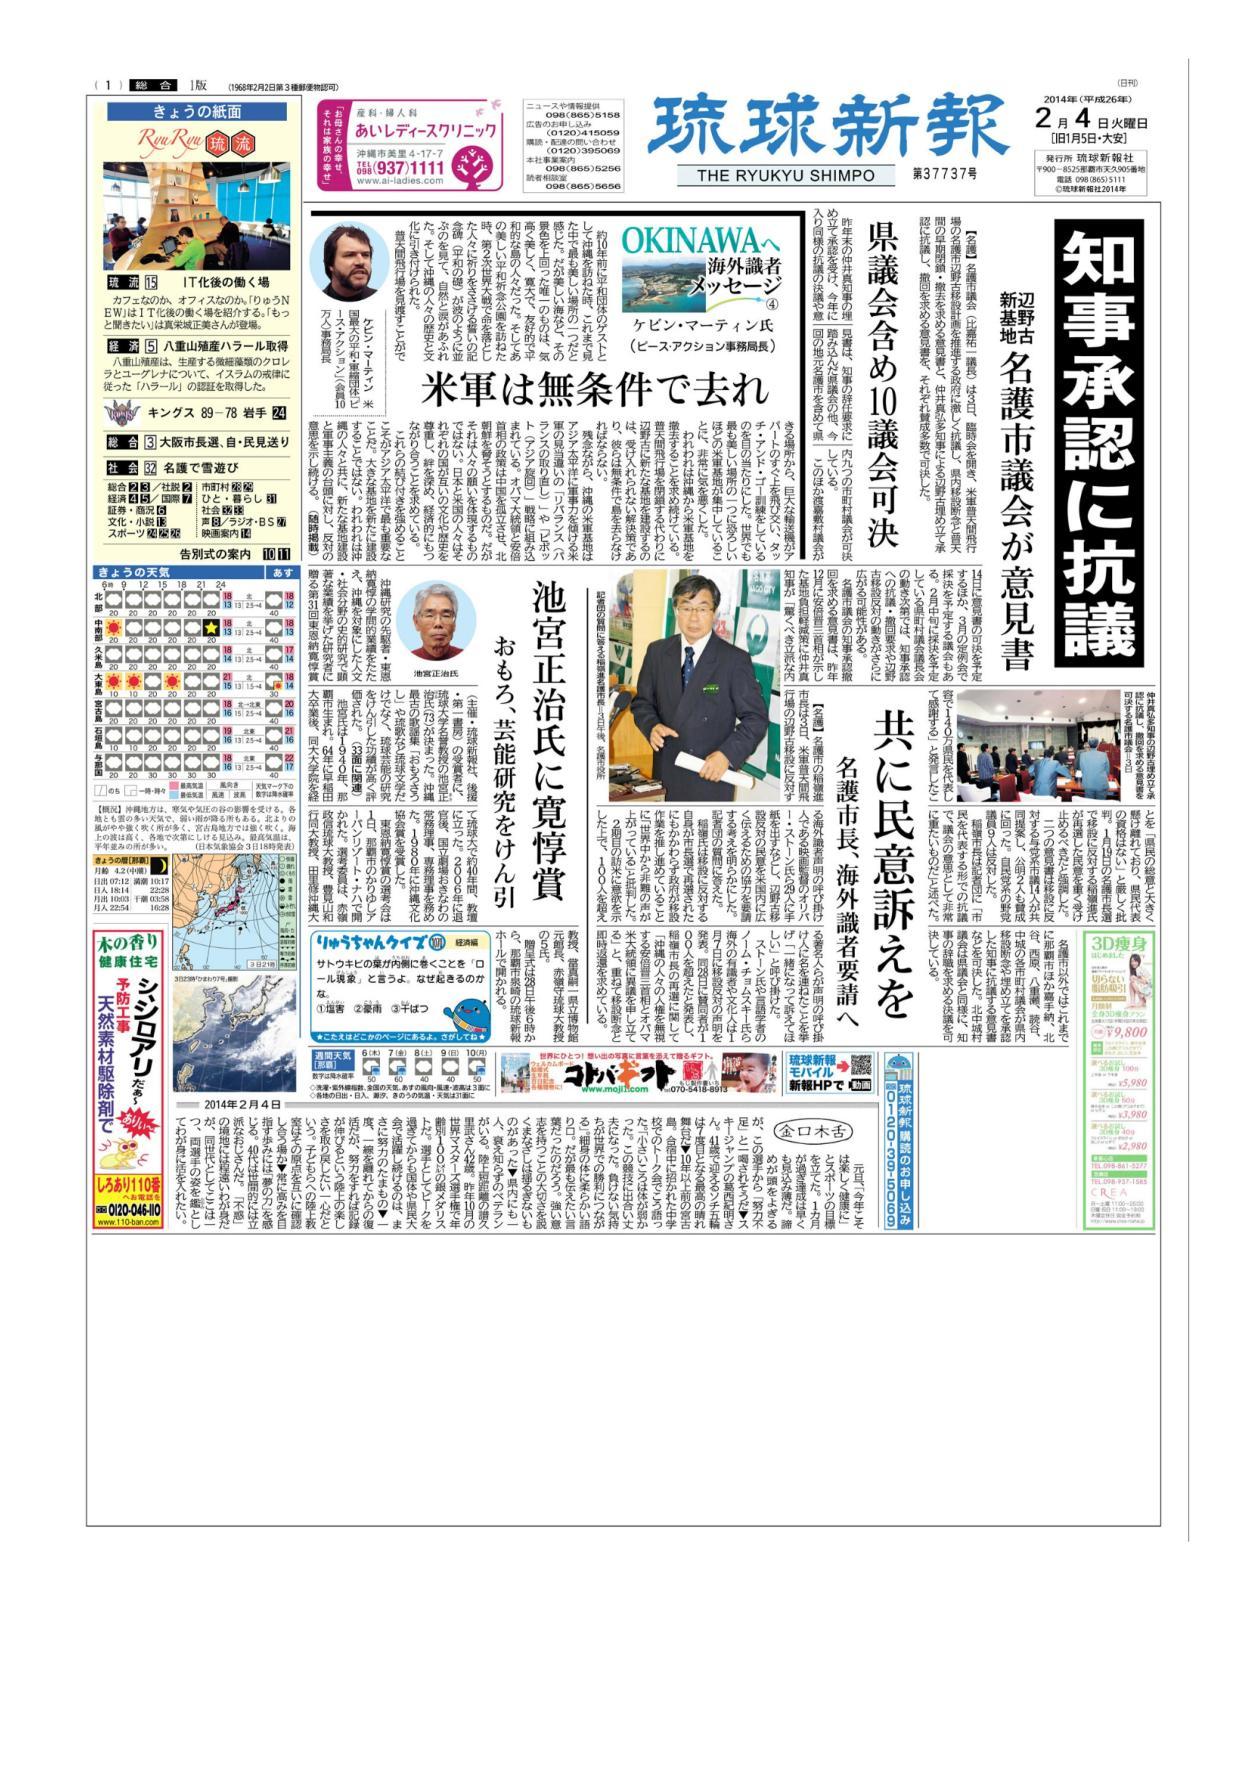 Feb 4 Ryukyu Shimpo Kevin Martin_01